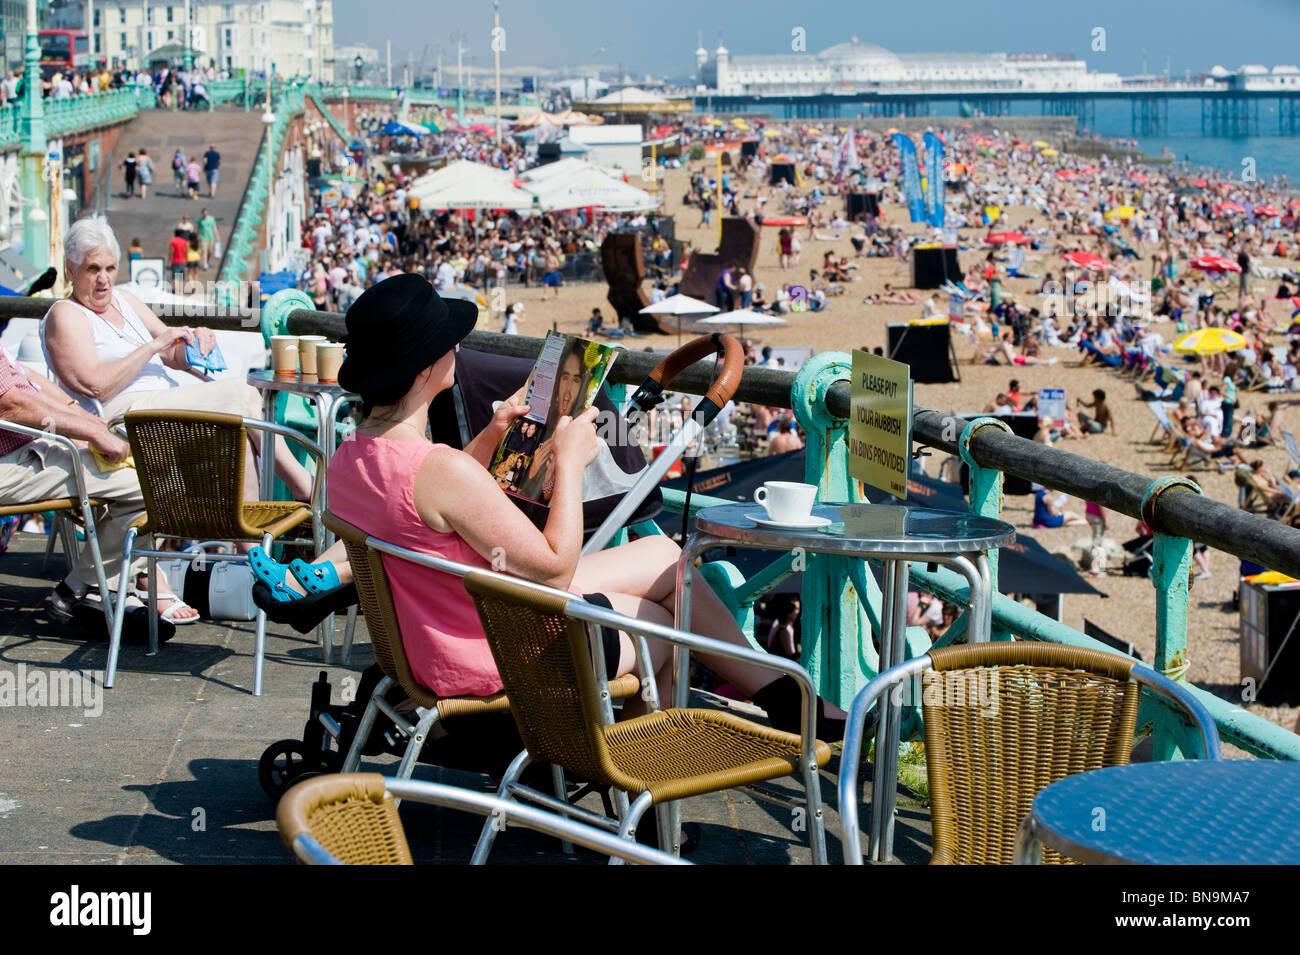 Crowded beach, Brighton, East Sussex, United Kingdom - Stock Image